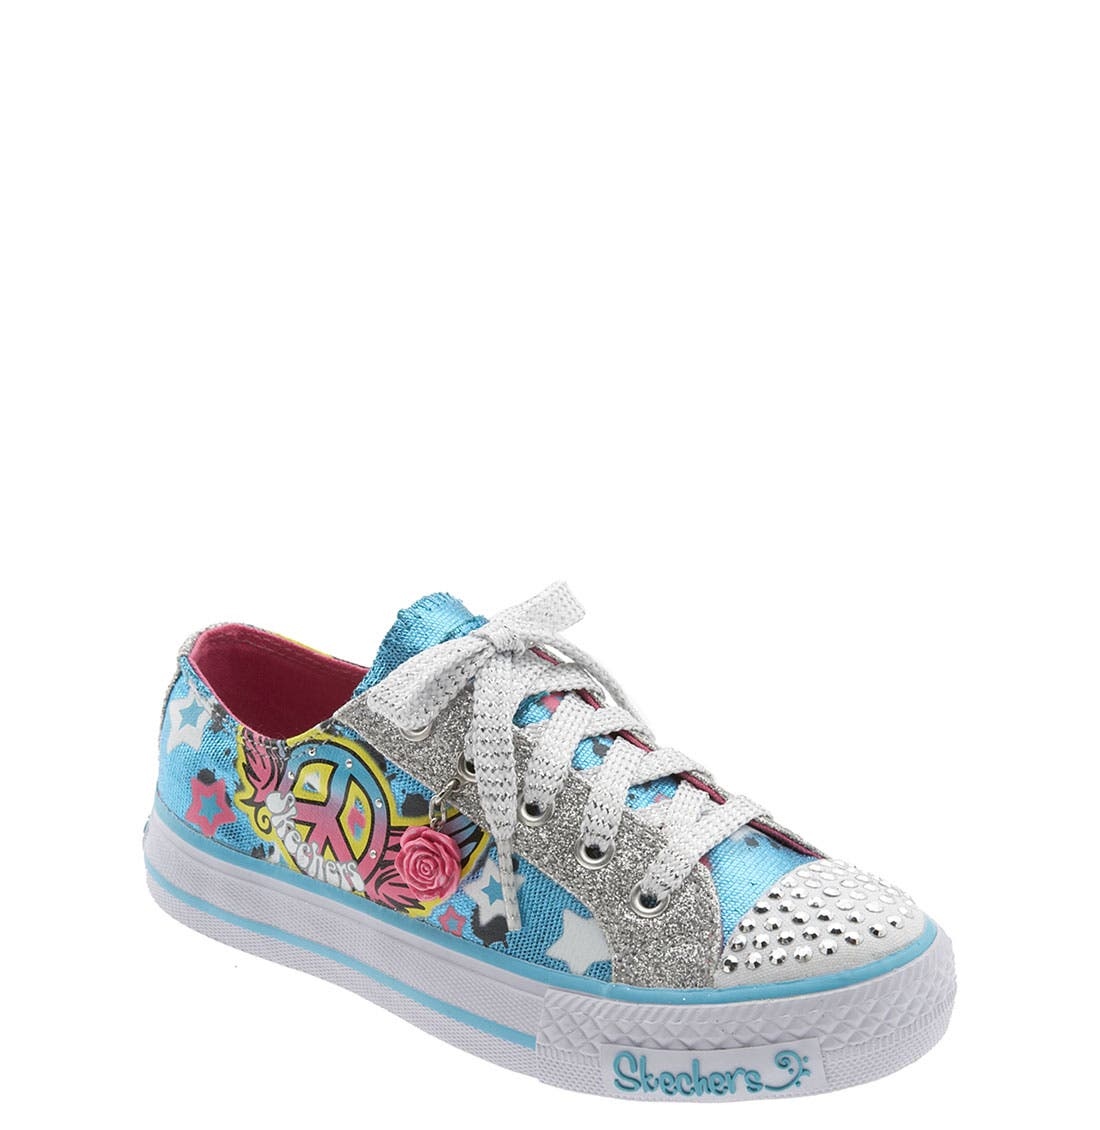 Alternate Image 1 Selected - SKECHERS 'Shuffles - Free Fall' Sneaker (Toddler, Little Kid & Big Kid)